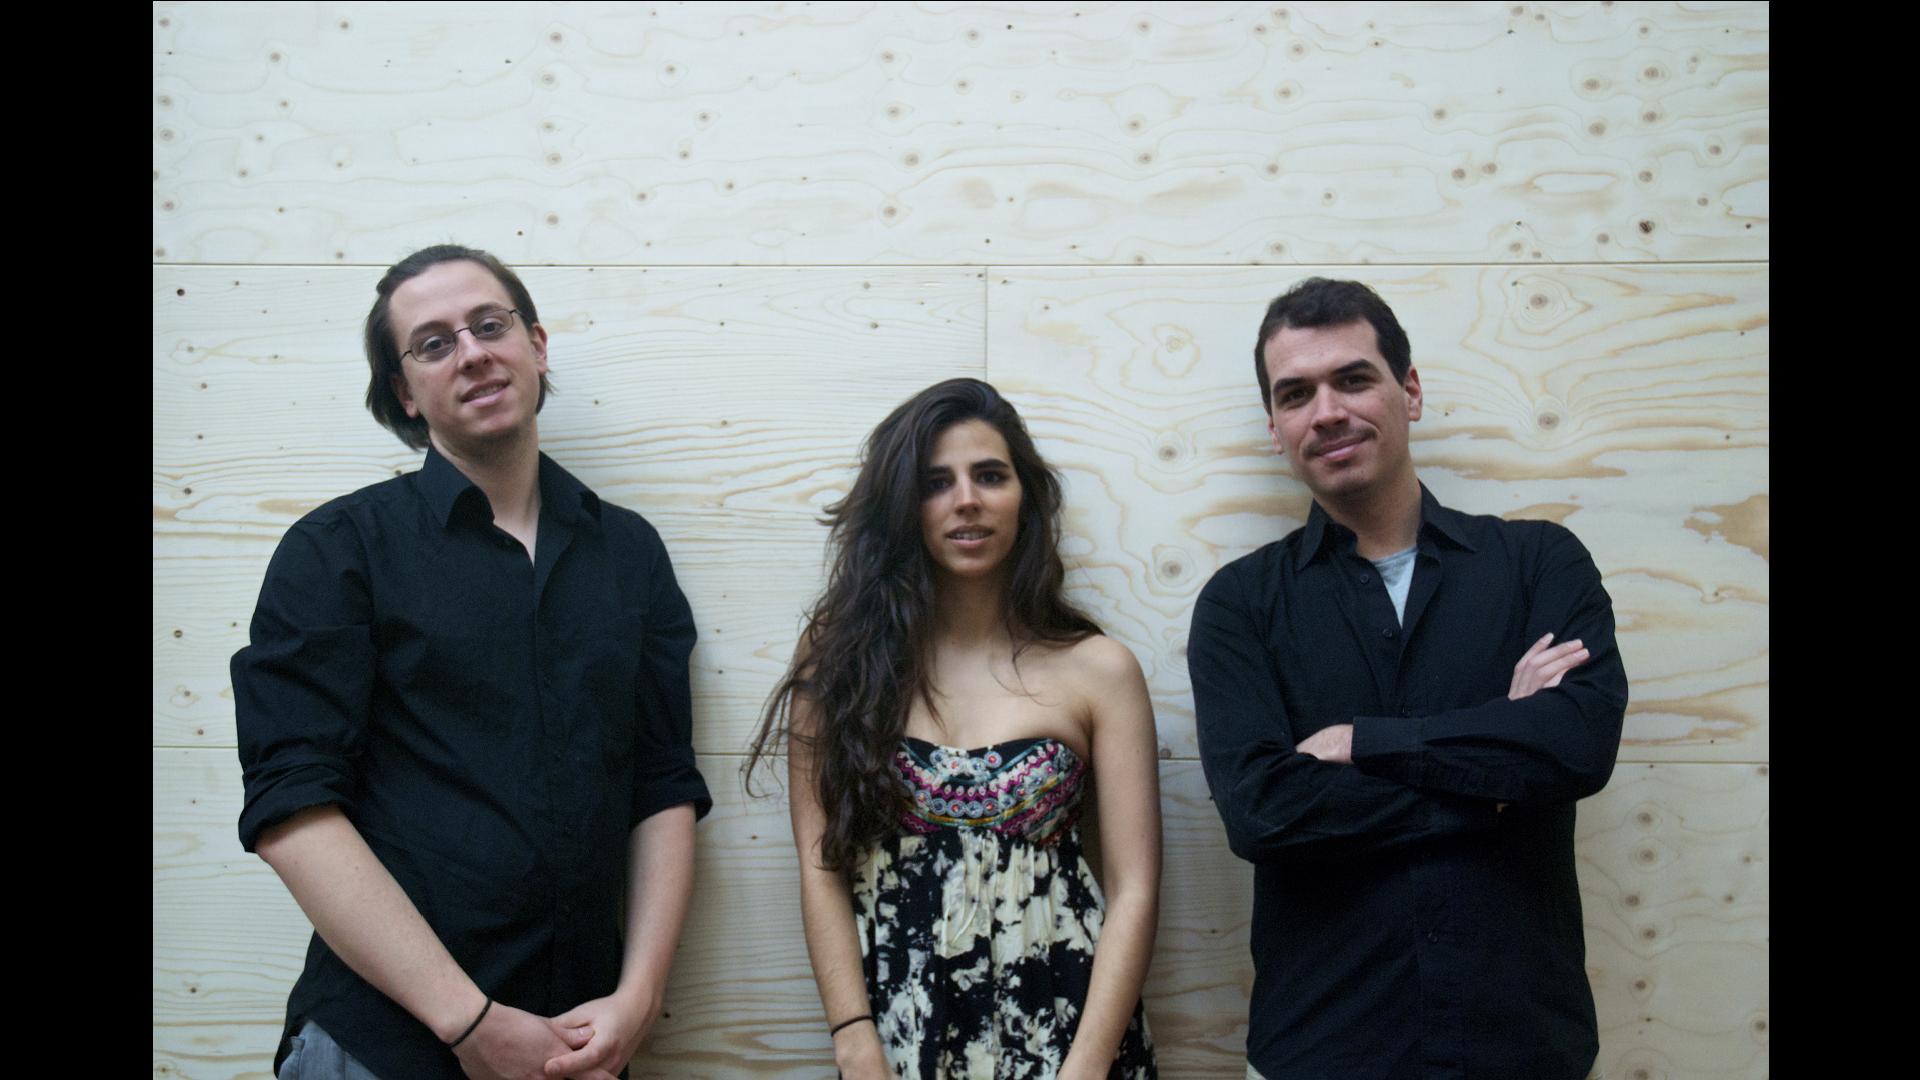 Lara Vizuete Trio 1920 1080